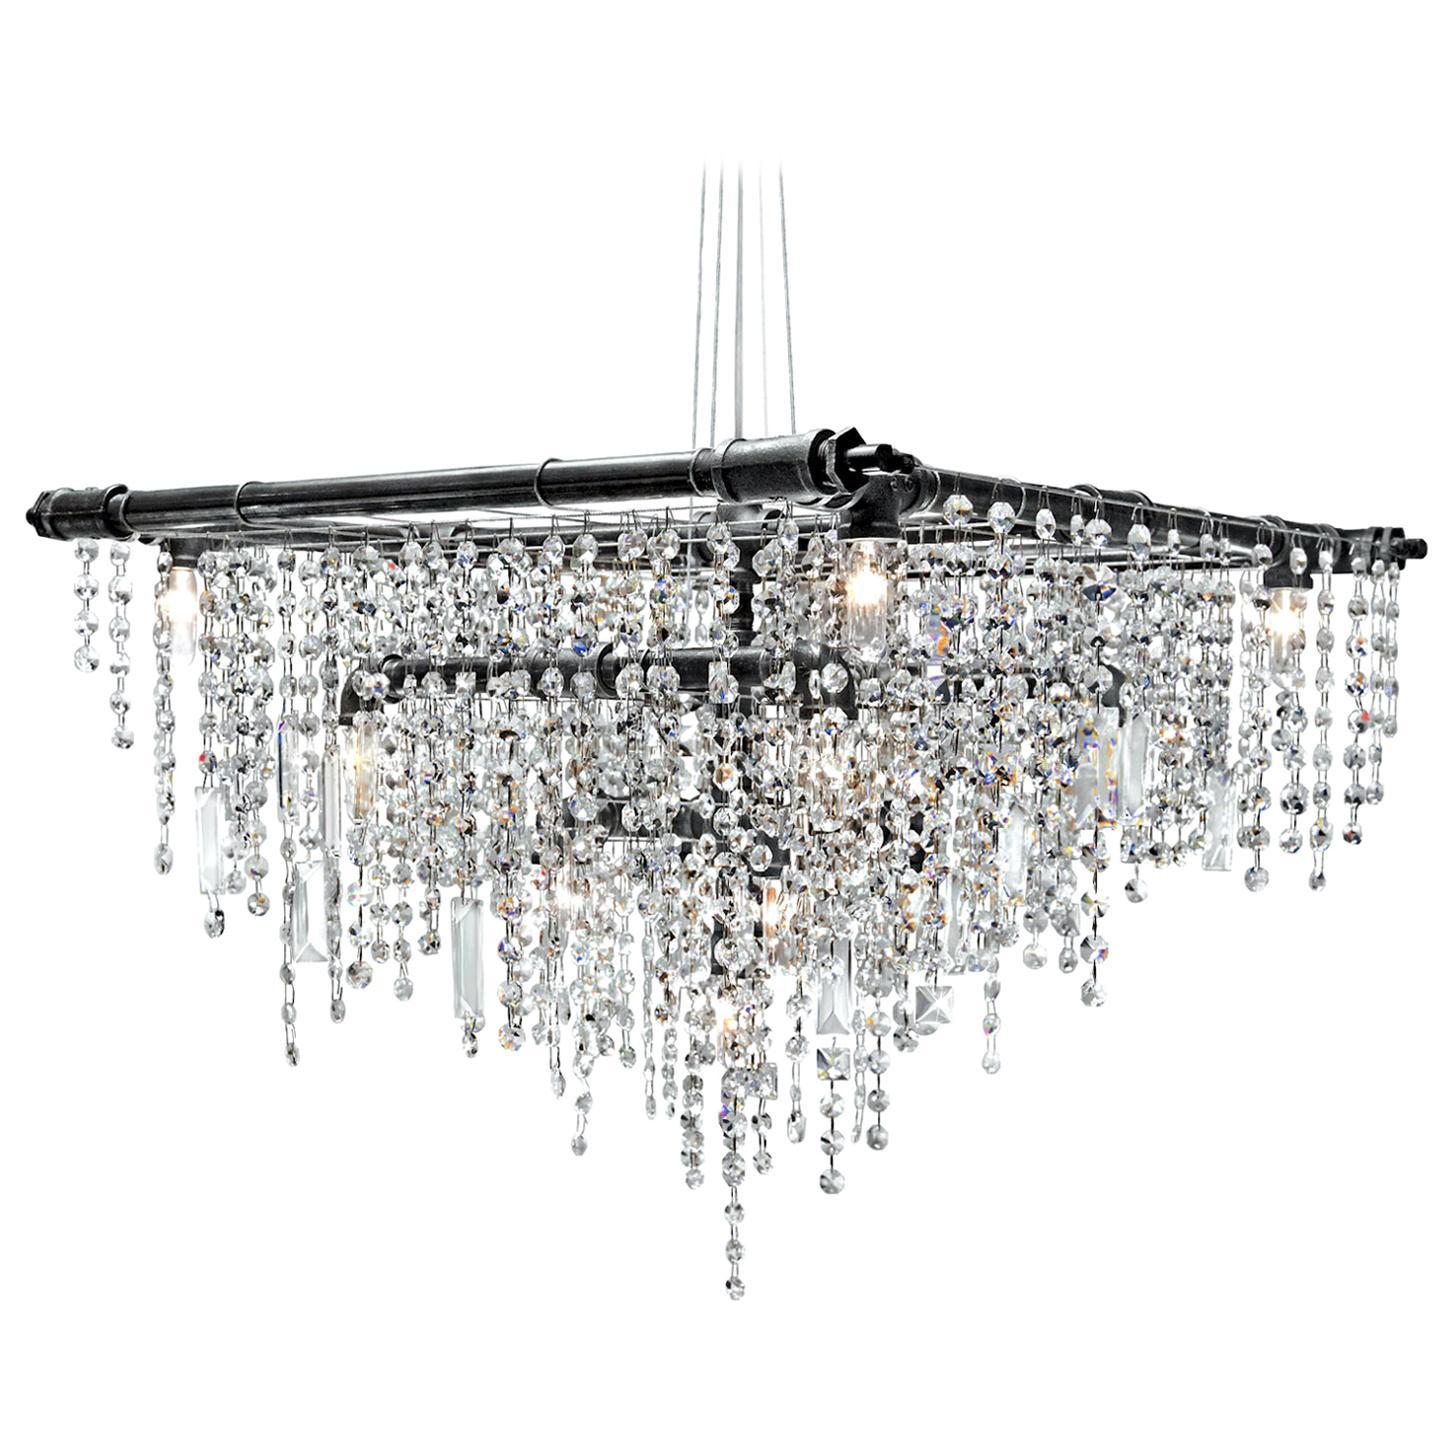 Tribeca Black Steel and Crystal Industrial 13-Light Beacon Chandelier